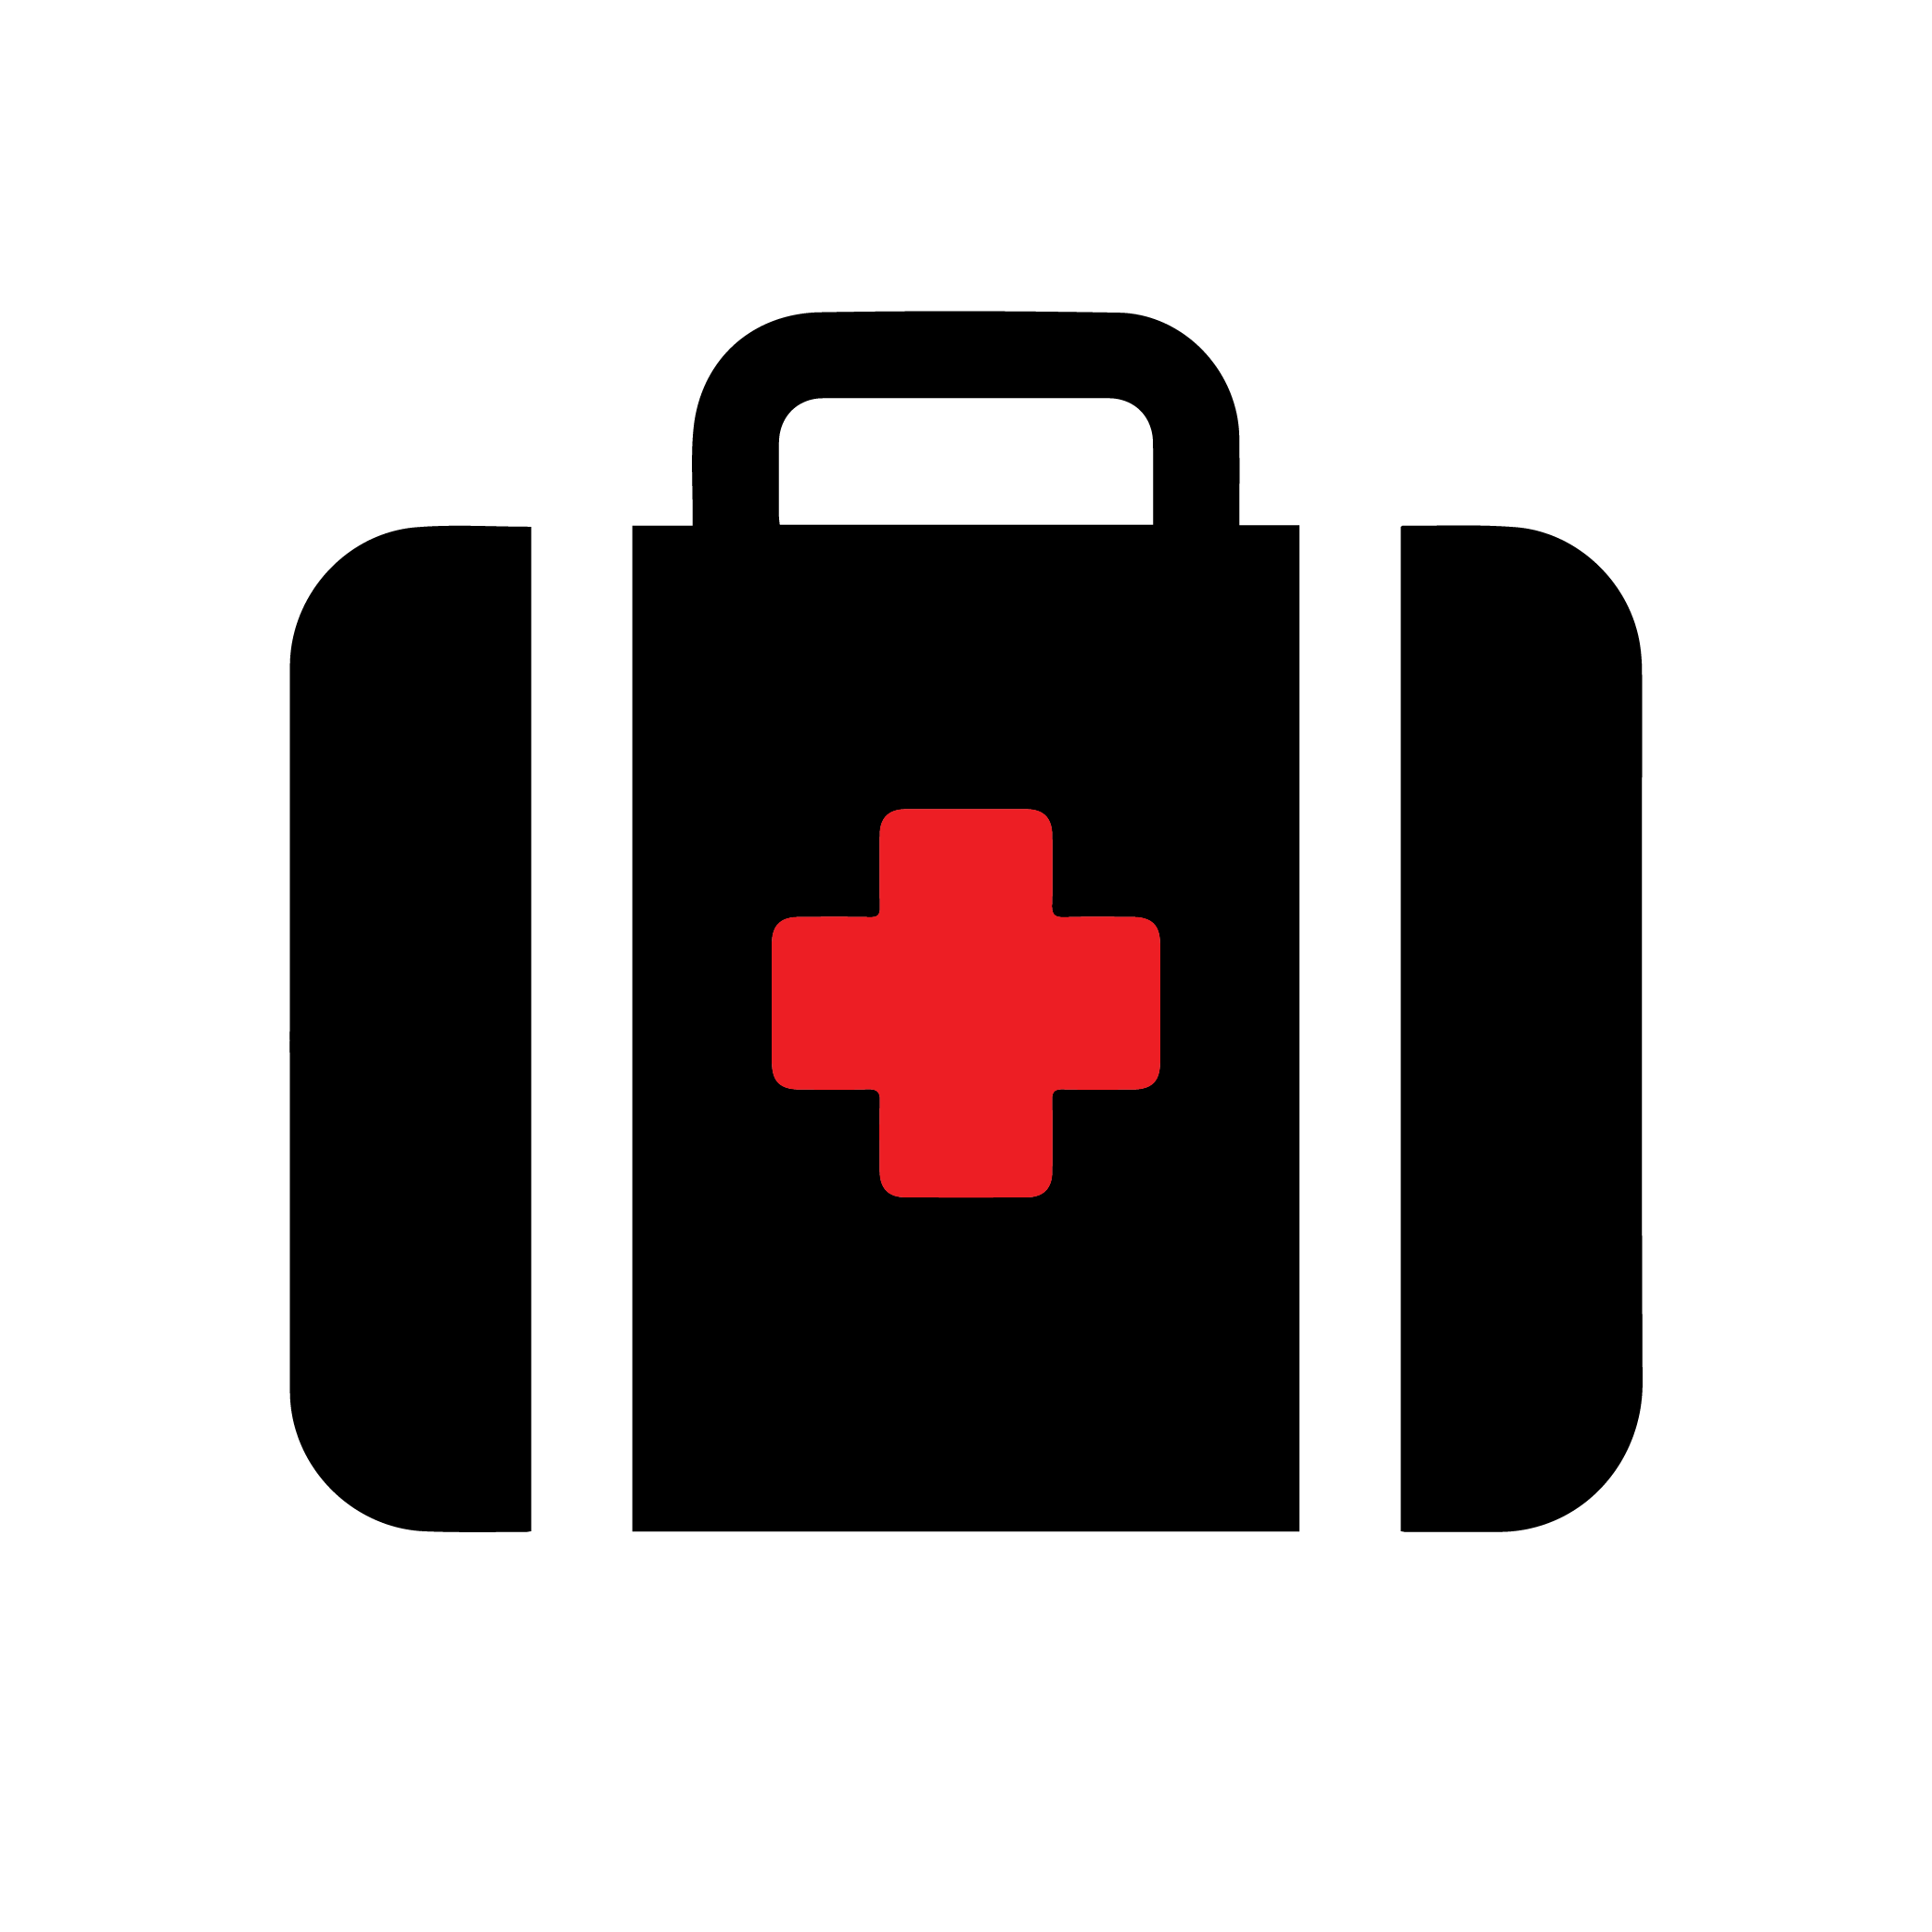 Ikon medical singapore ikonicons. Healthcare clipart hospital material